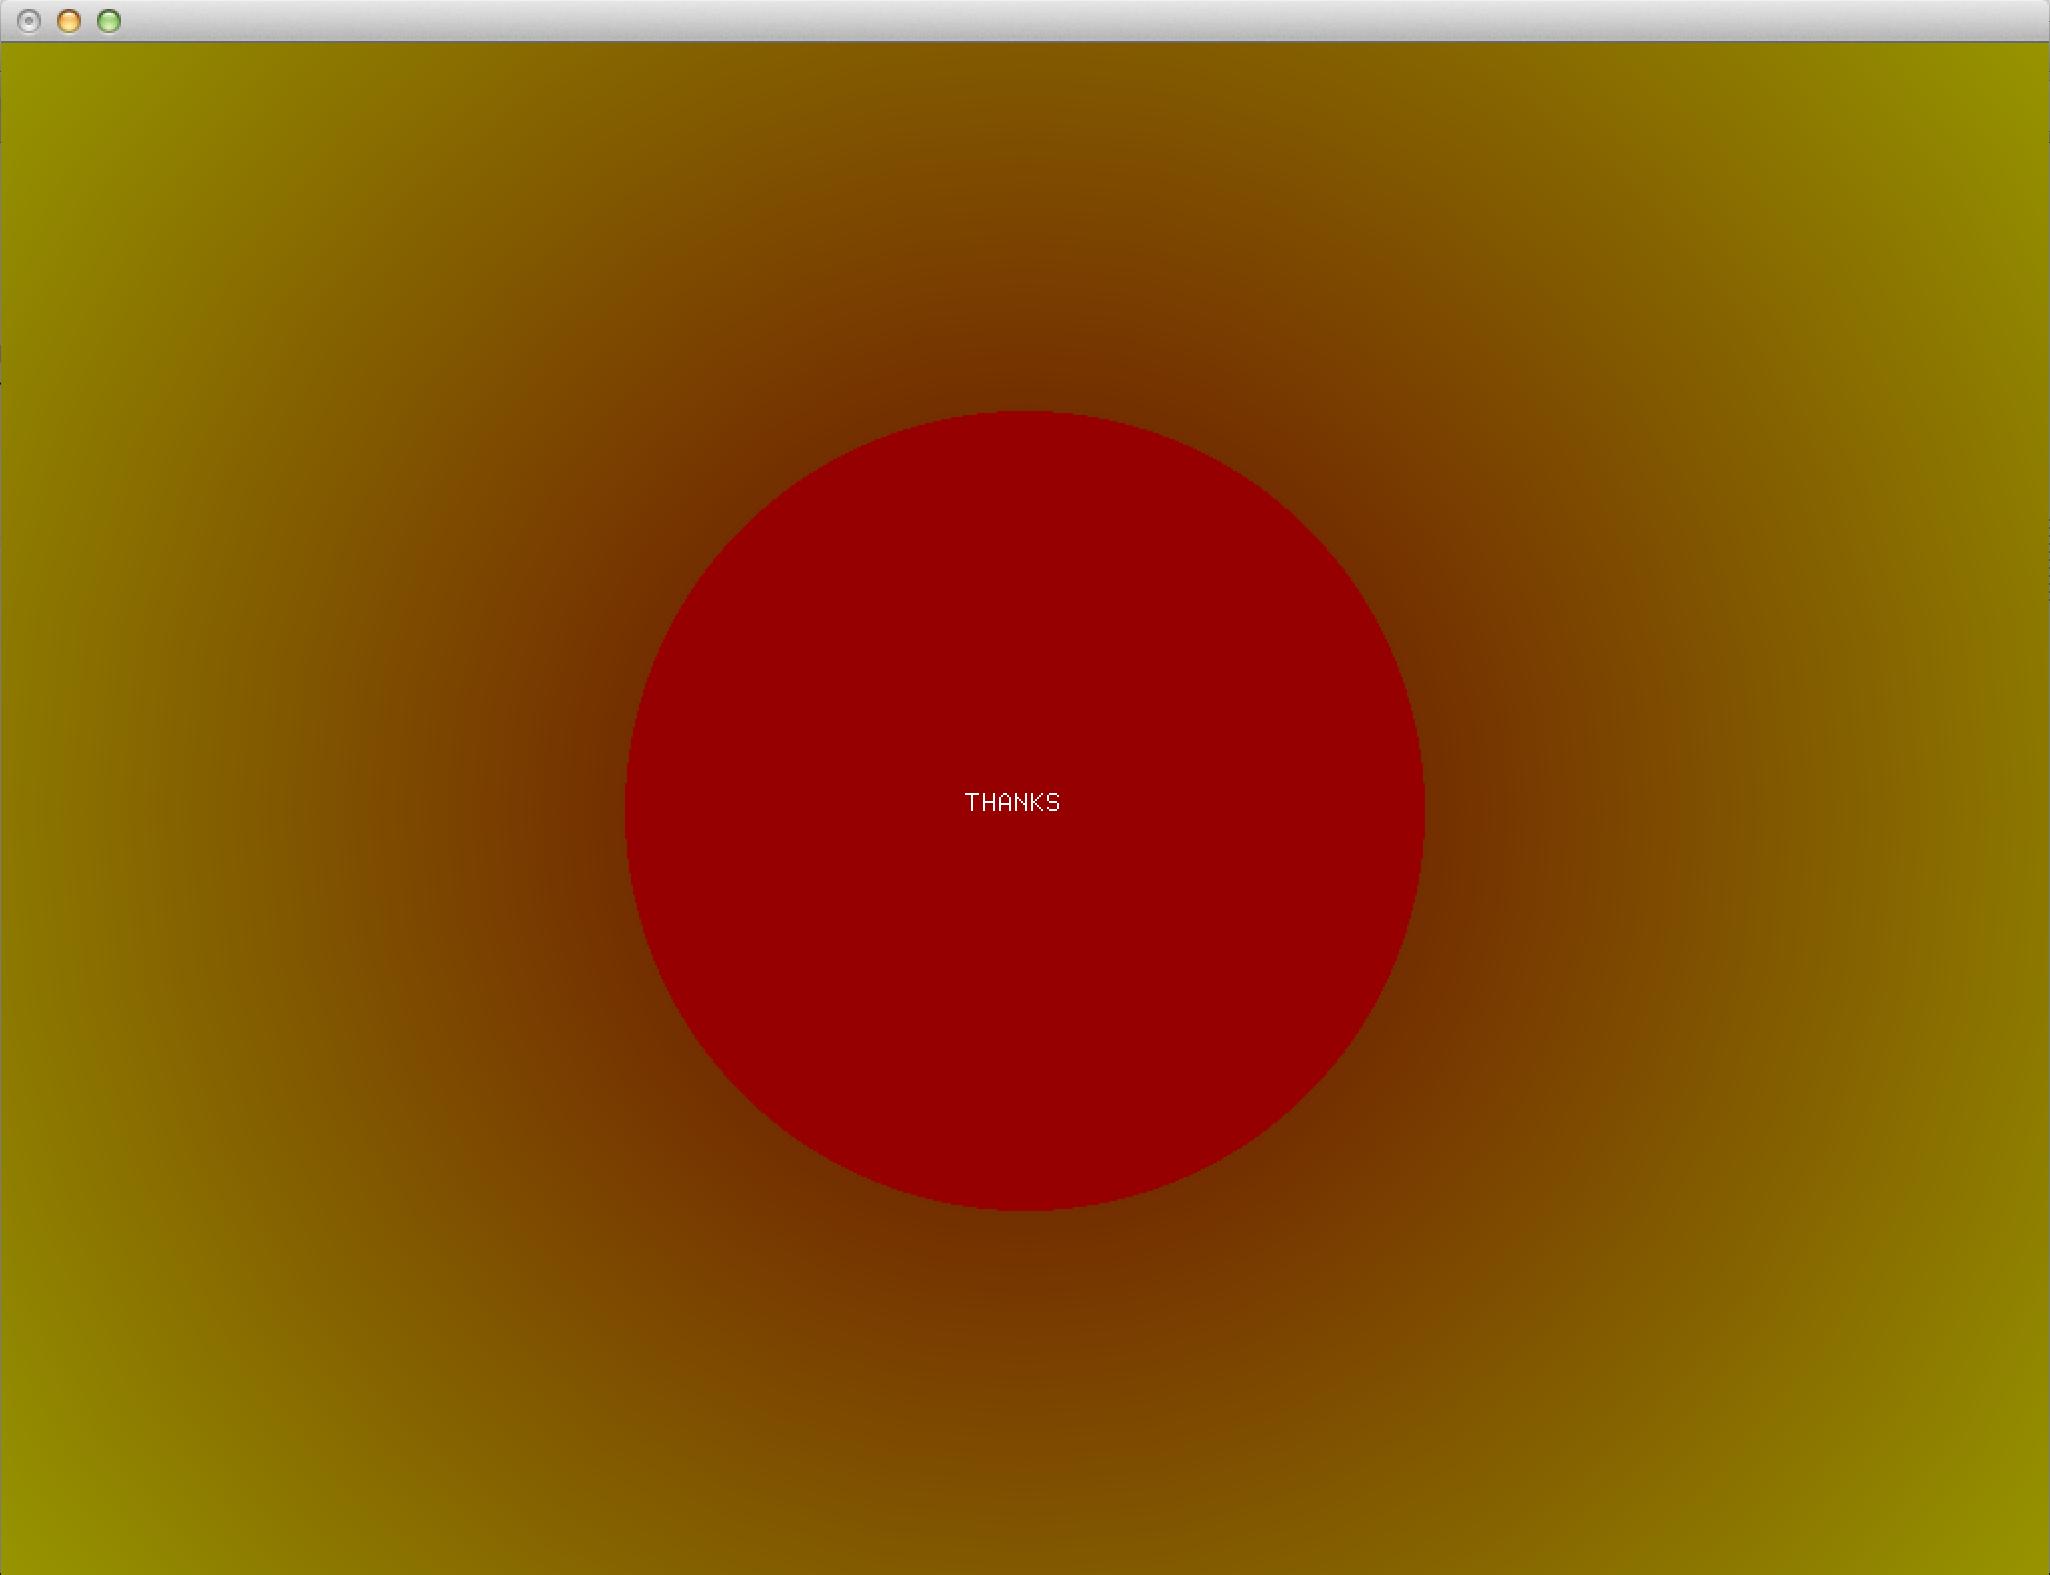 Screen Shot 2013-02-07 at 12.47.57 PM copy.png